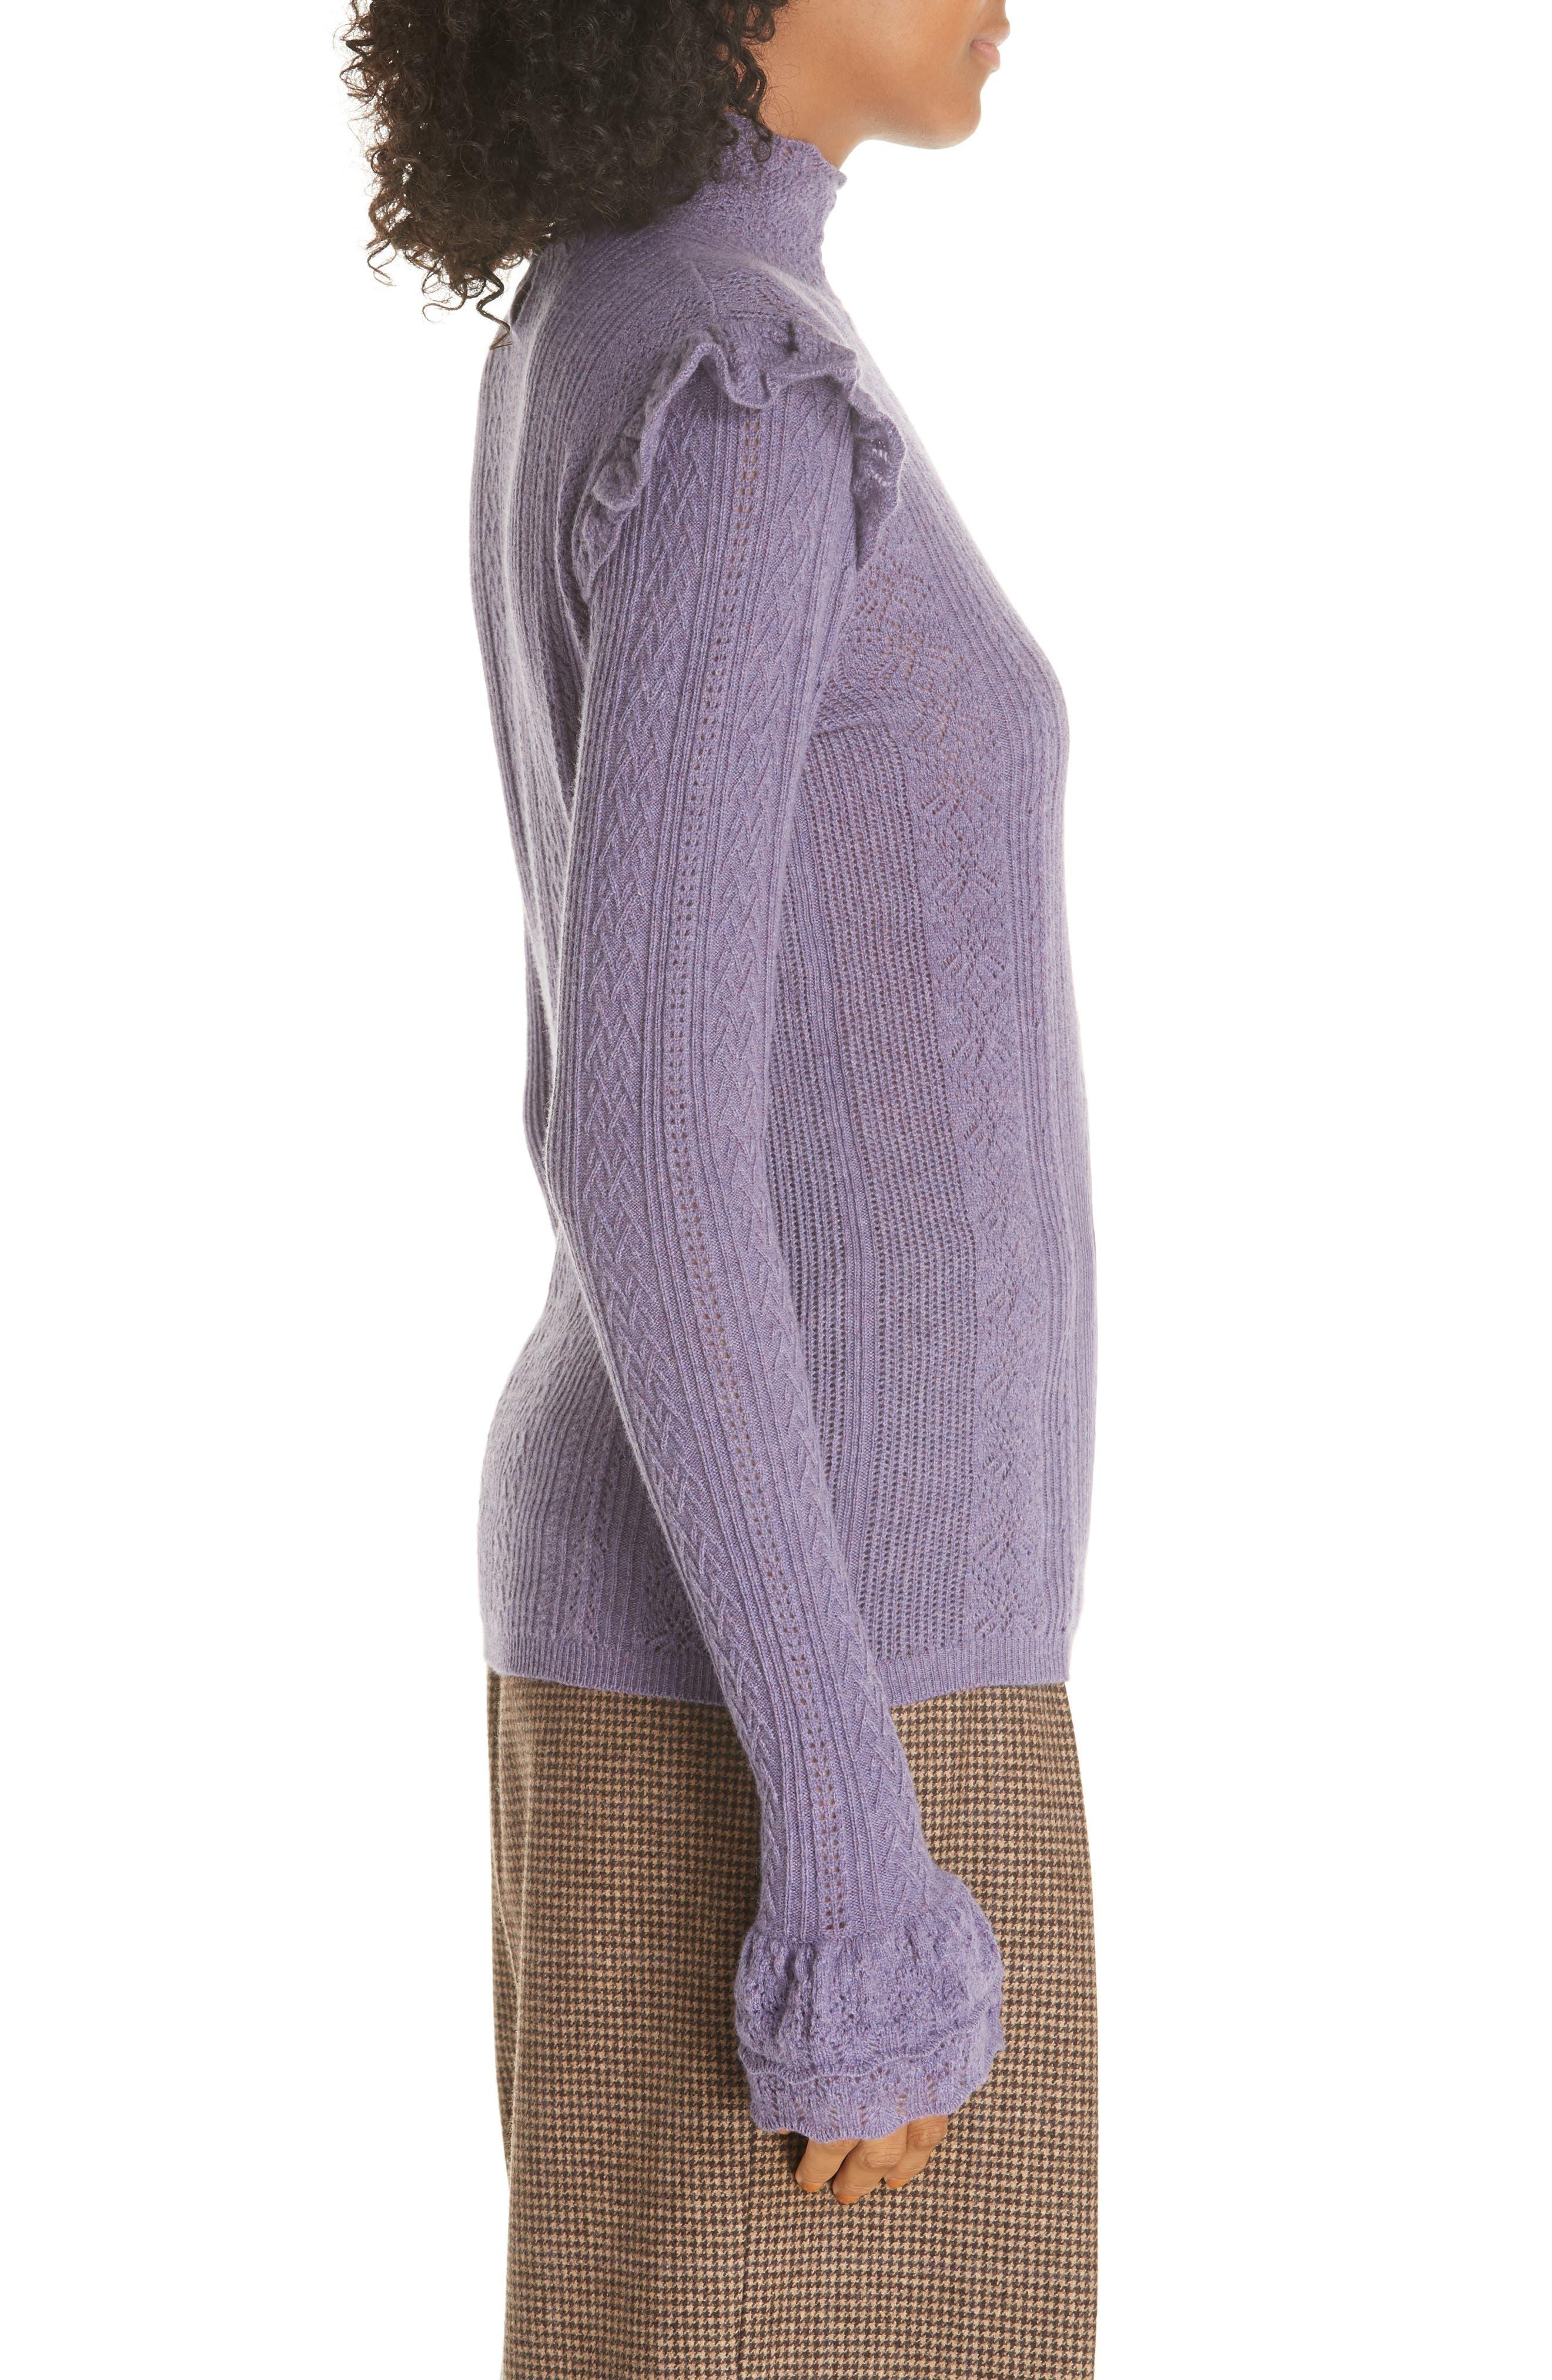 POLO RALPH LAUREN,                             Ruffle Detail Pointelle Sweater,                             Alternate thumbnail 3, color,                             500